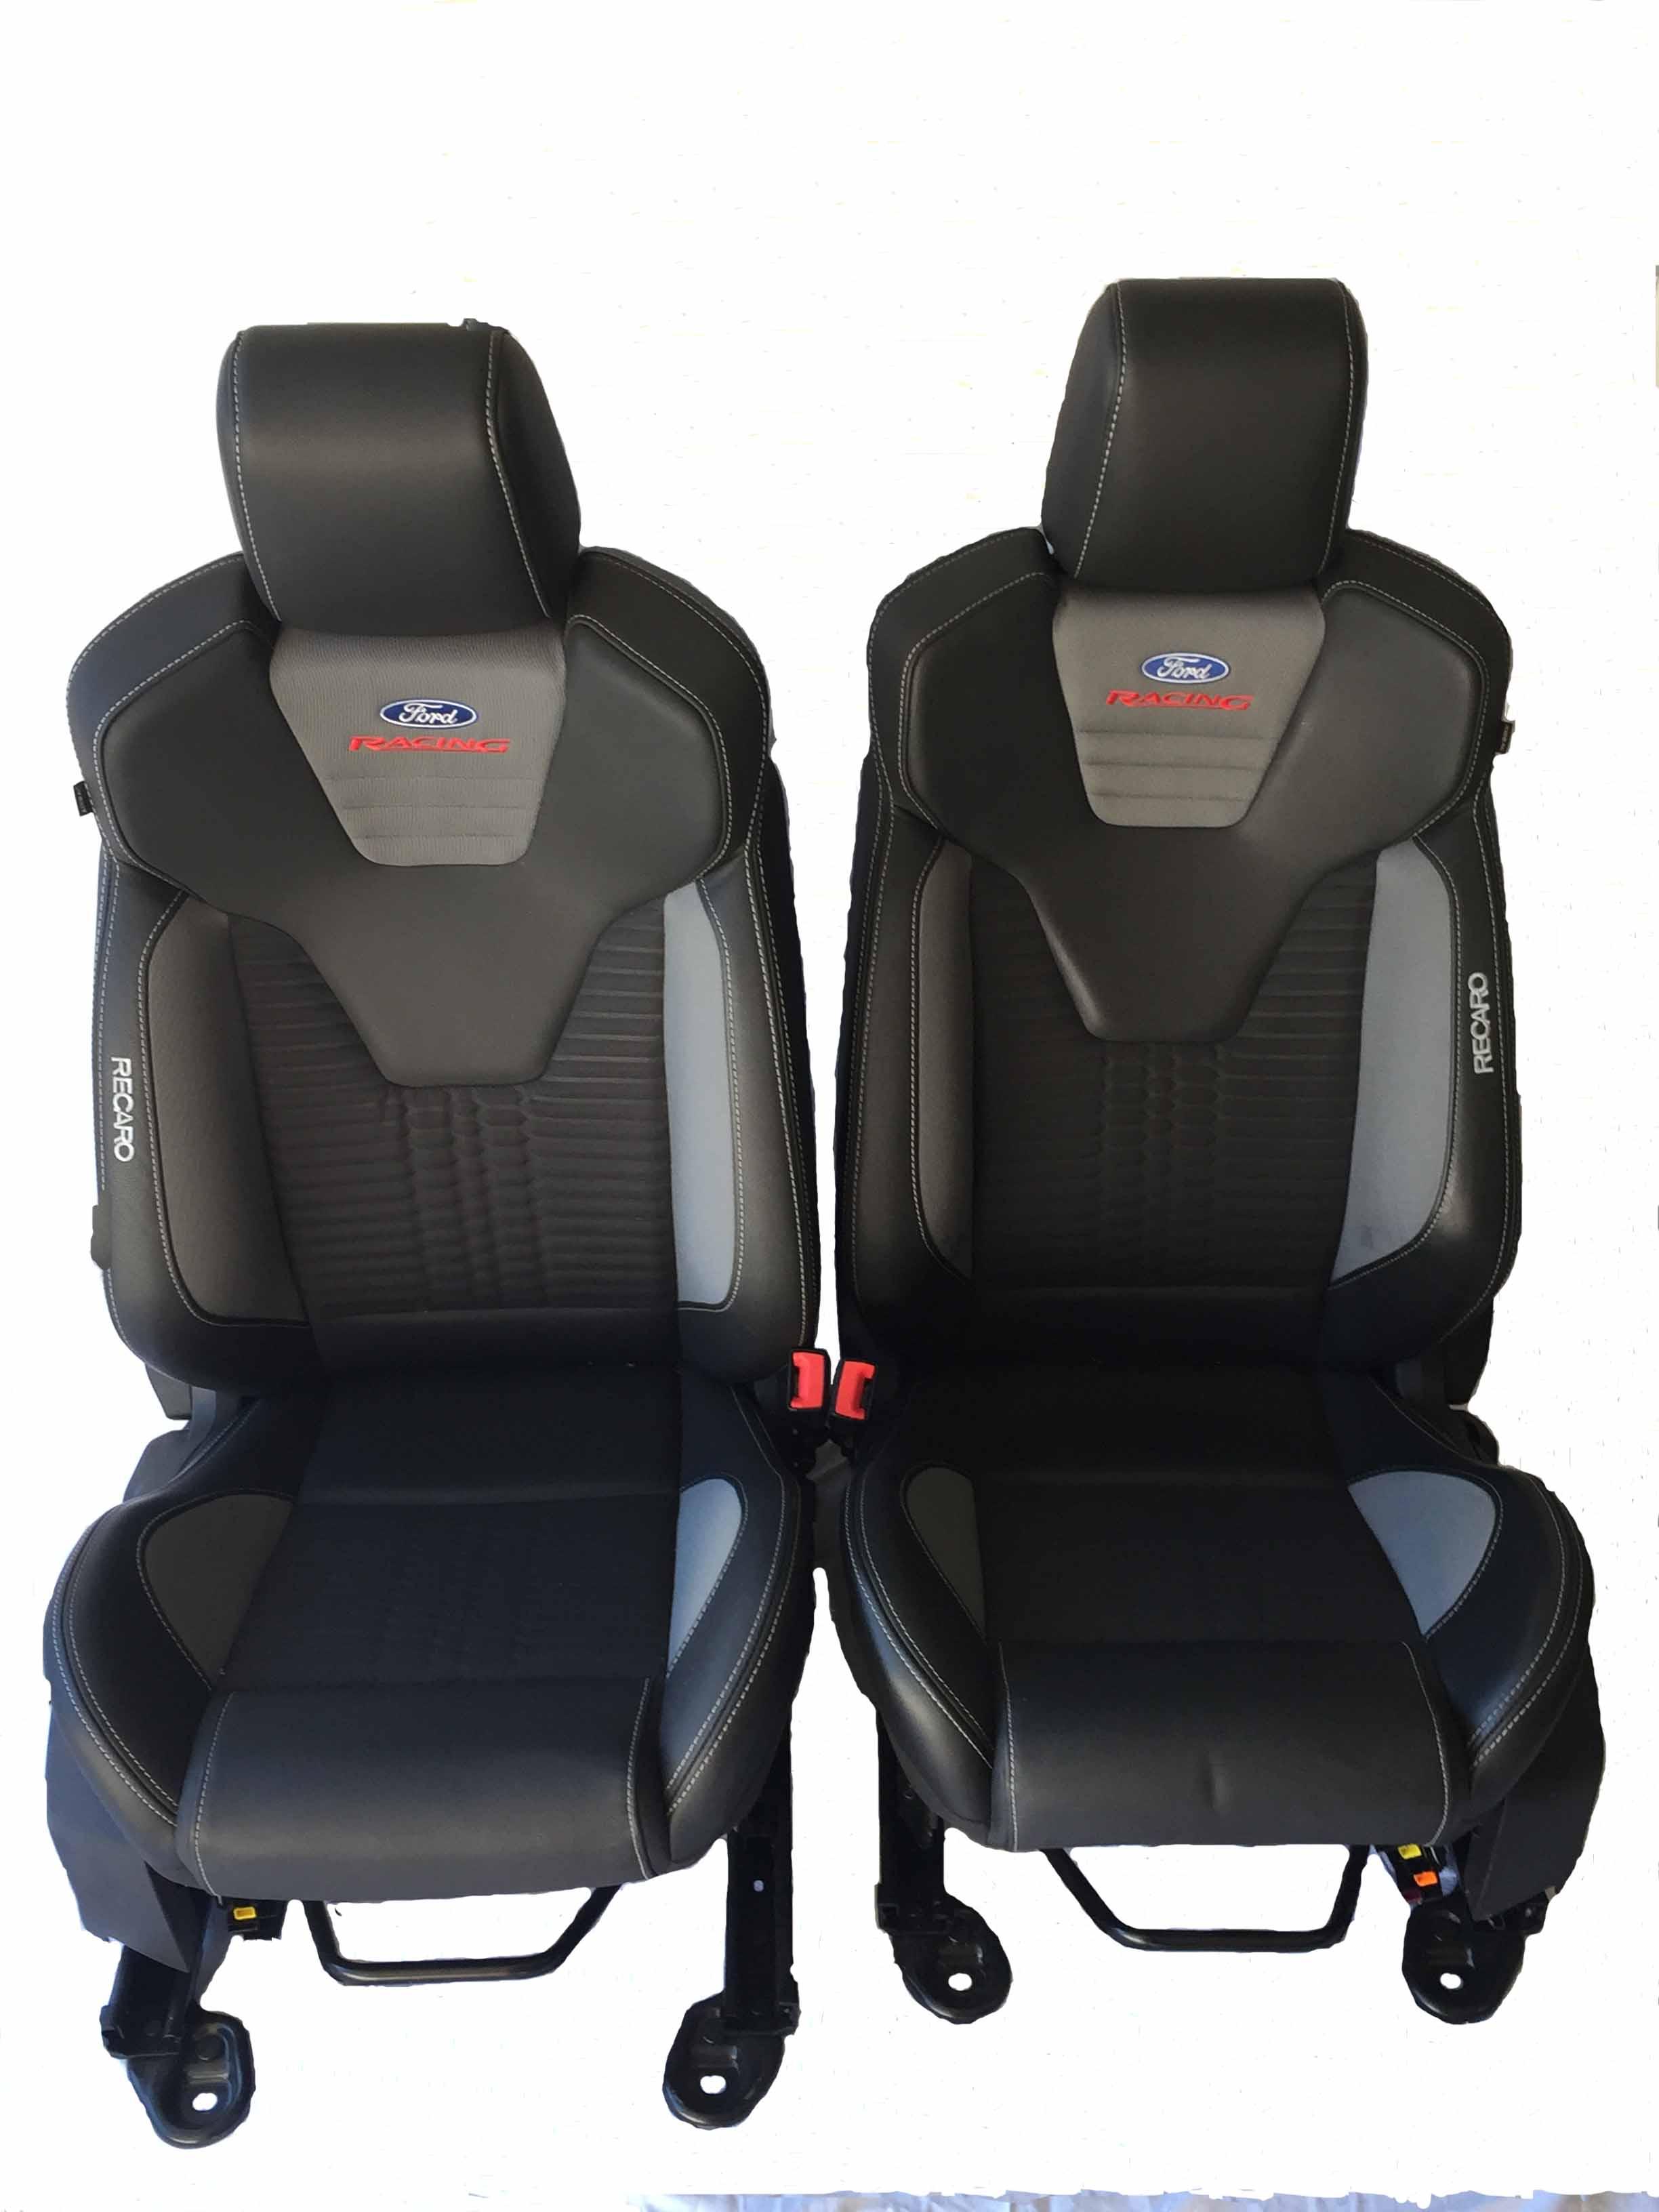 ford focus recaro seat covers velcromag. Black Bedroom Furniture Sets. Home Design Ideas